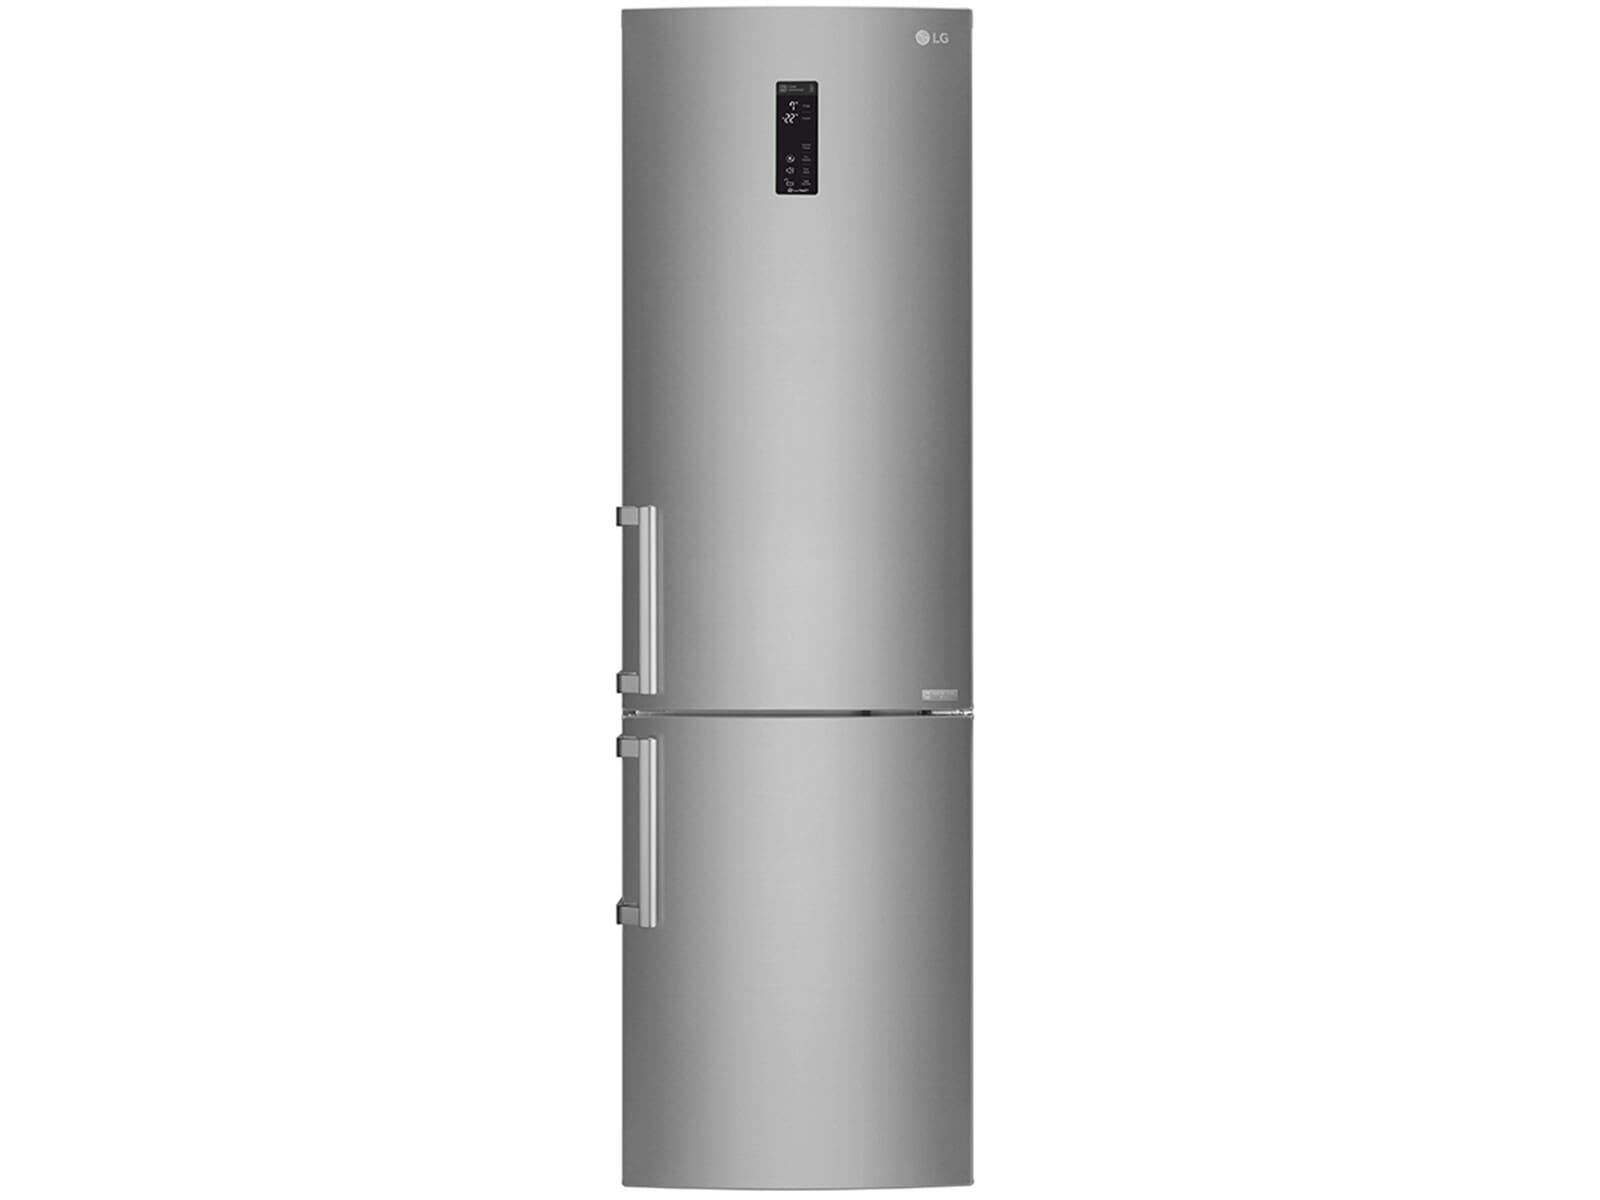 Gorenje Kühlschrank Lüfter : Lg gbb 60 sayxe kühl gefrierkombination saffiano oberfläche